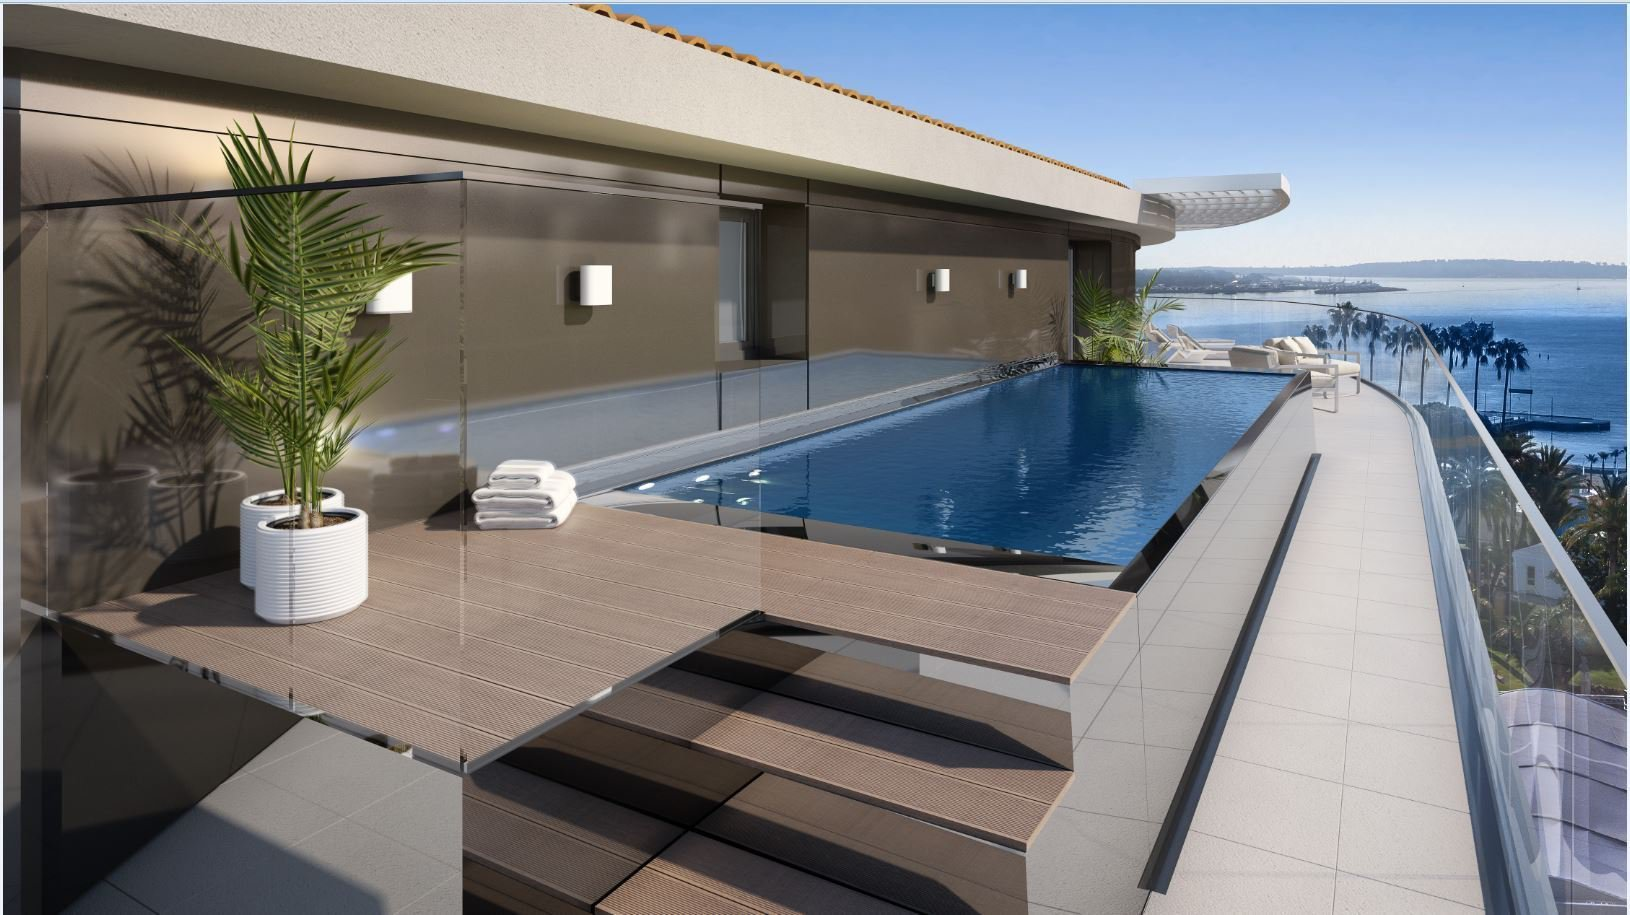 Apartment in Cannes, Provence-Alpes-Côte d'Azur, France 1 - 10610534